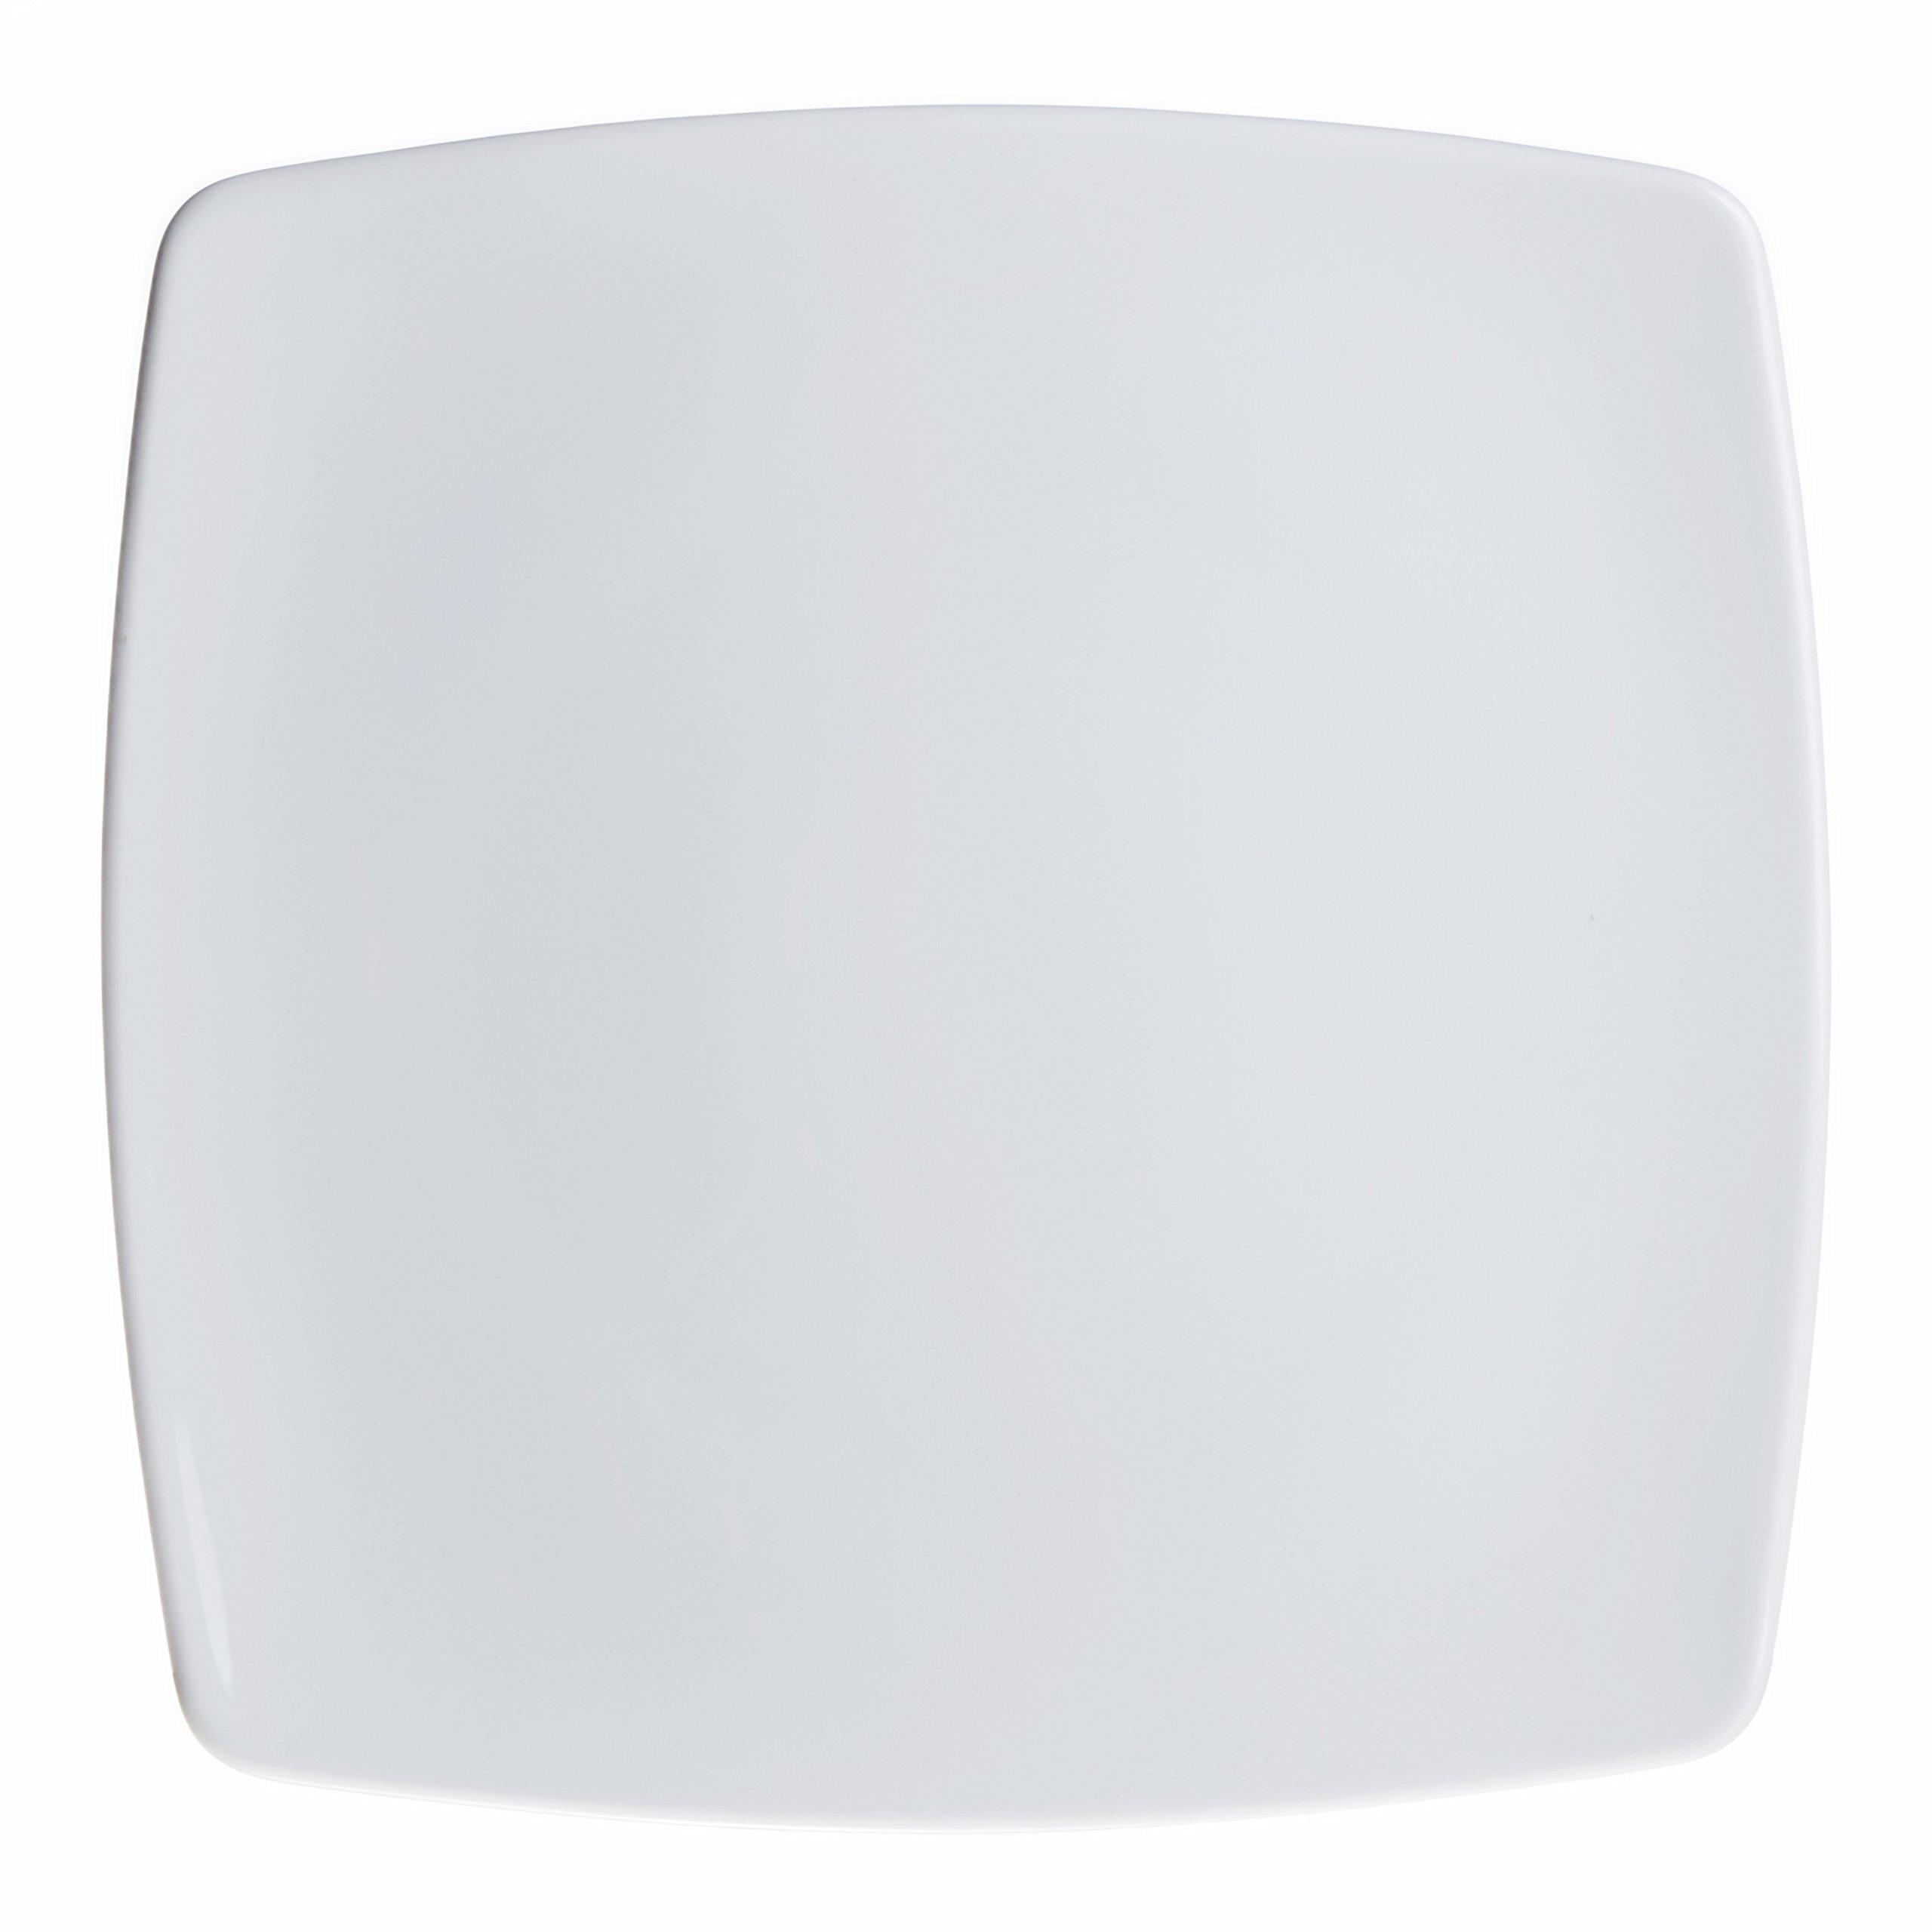 6-Piece Square Dinner/Serving Plates Set, White Porcelain, Restaurant&Hotel Quality, size 10.2''